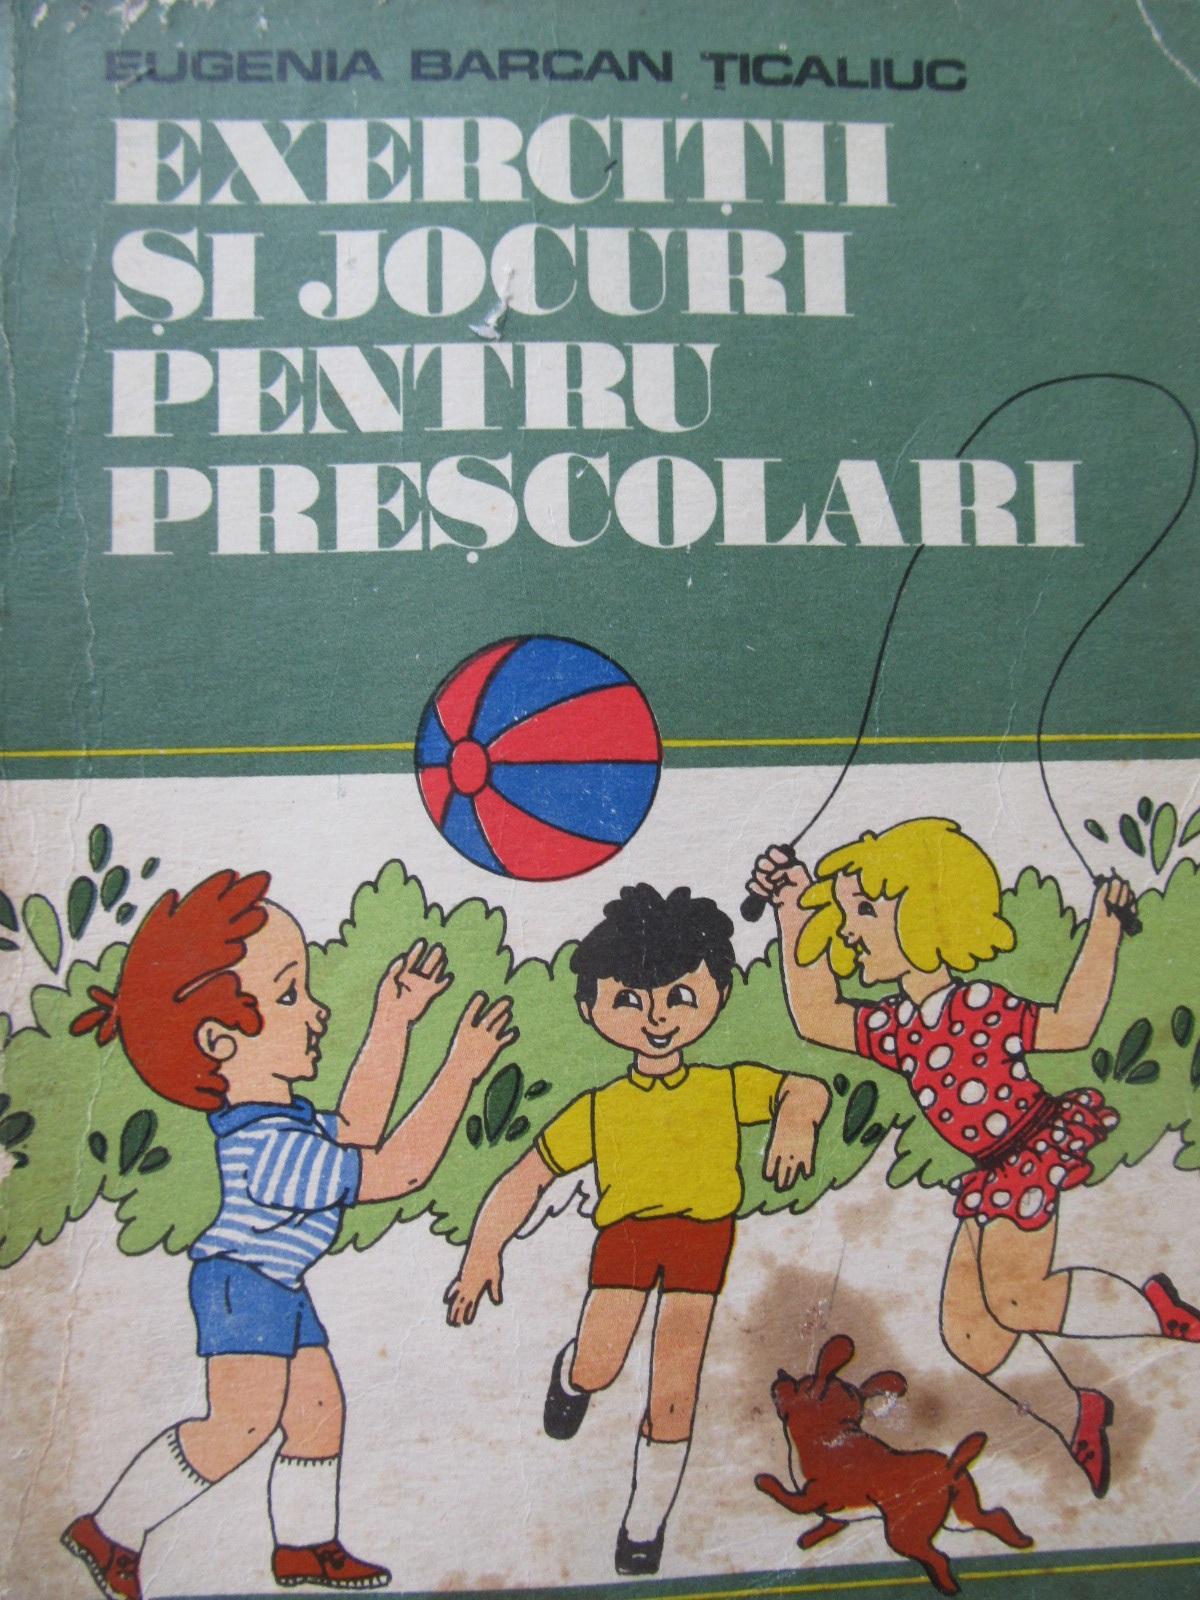 Exercitii si jocuri pentru prescolari - Eugen Barcan Ticaliuc | Detalii carte